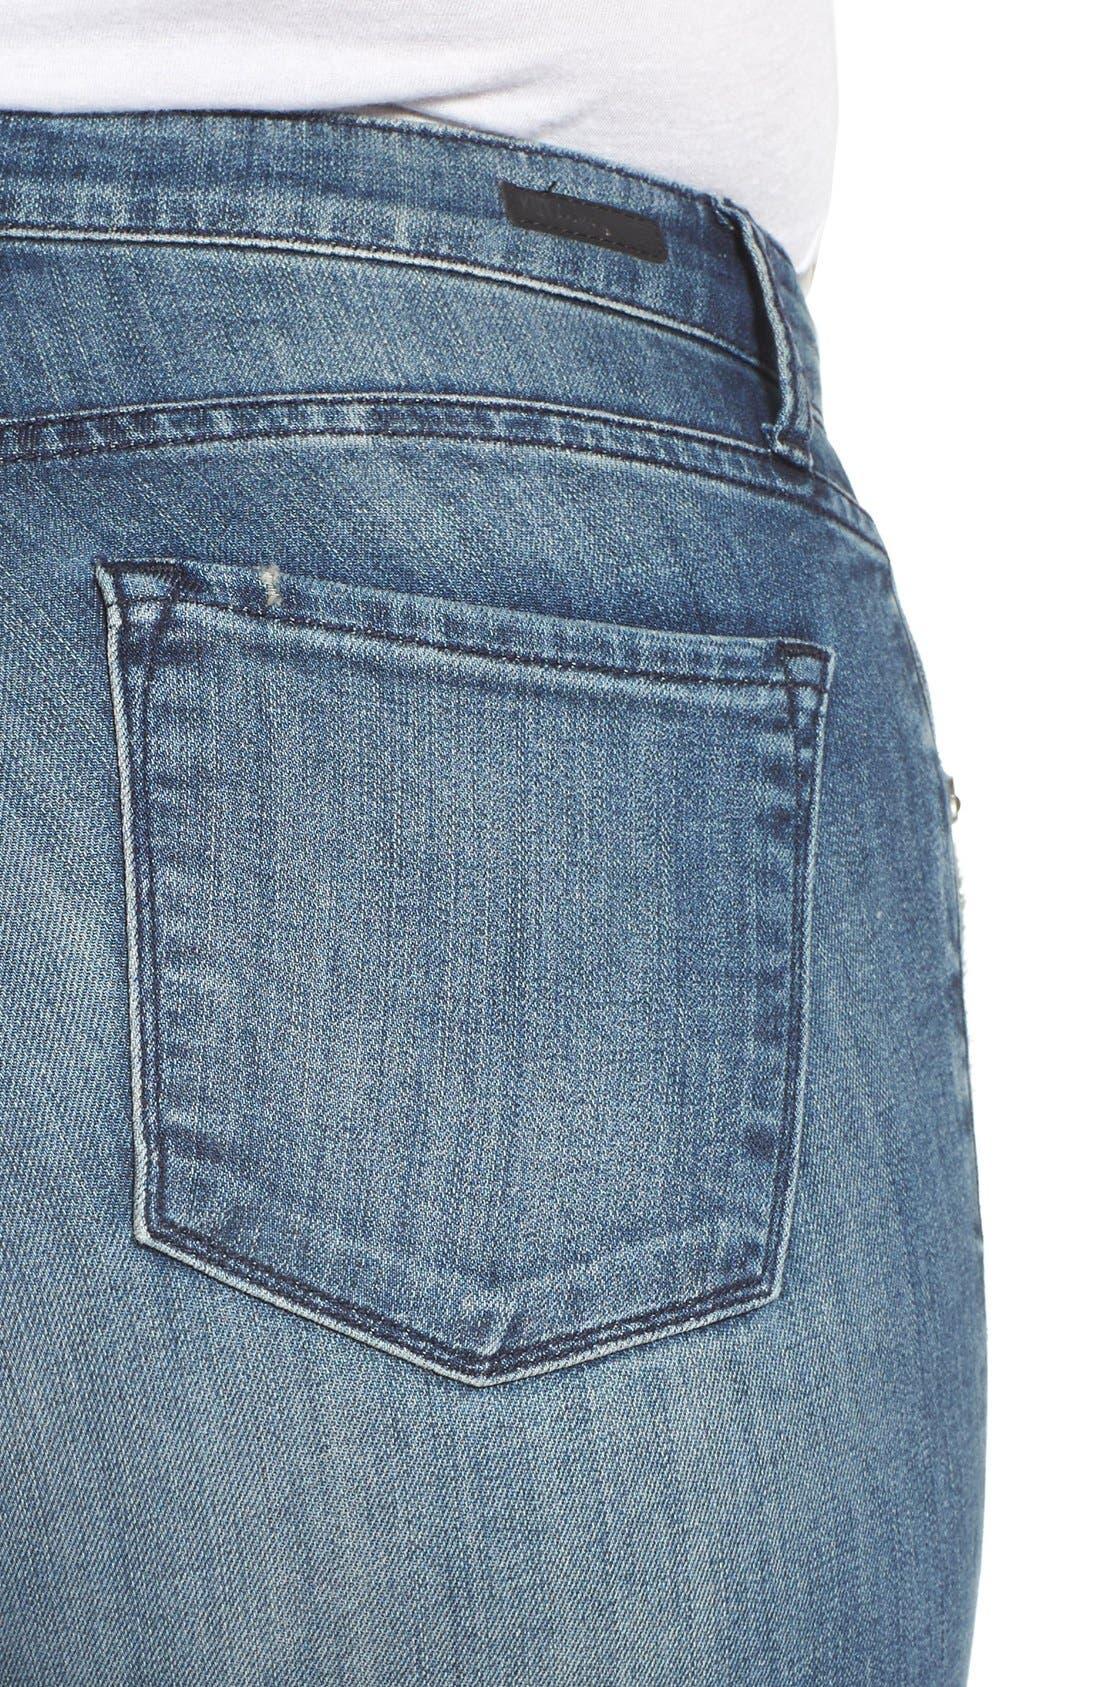 'Reese' Crop Flare Leg Jeans,                             Alternate thumbnail 2, color,                             453